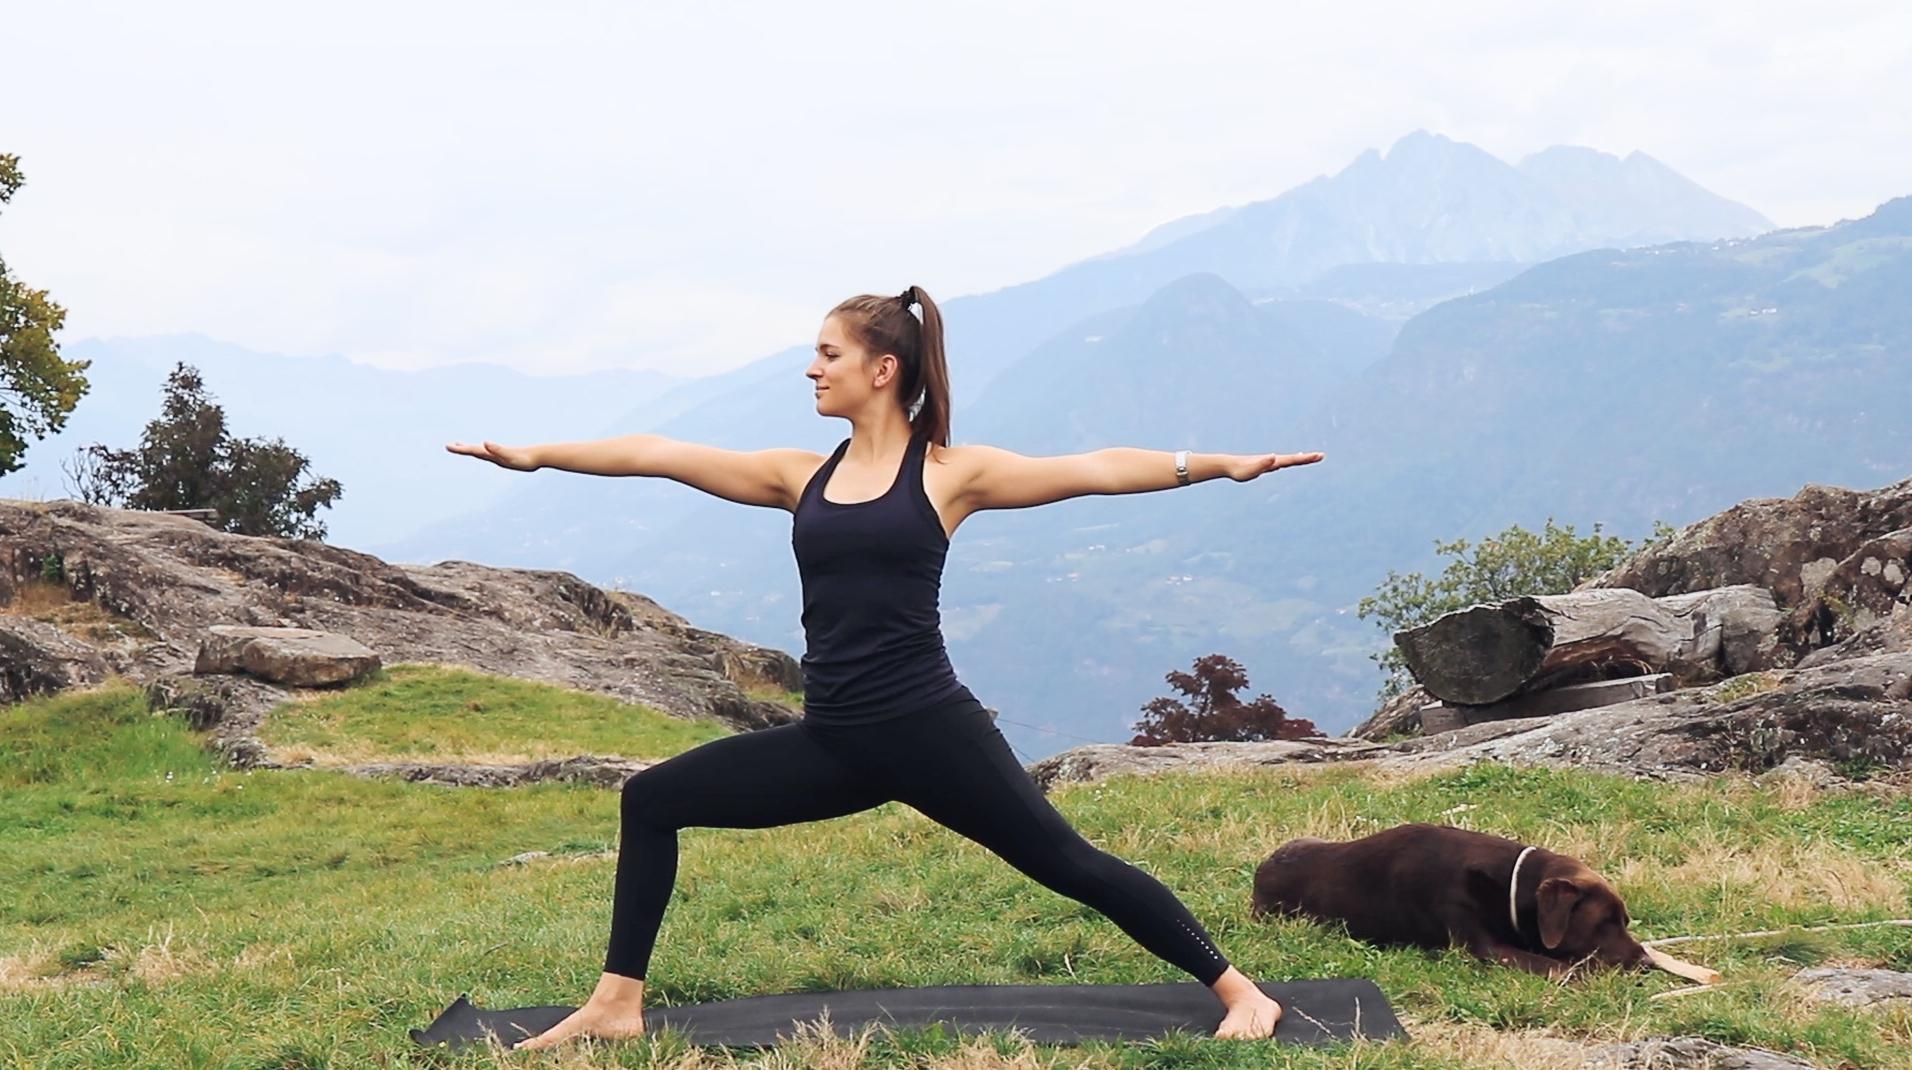 Mady-Morrison-Yoga-Mountain-Flow-Kraft-Staerke-00007